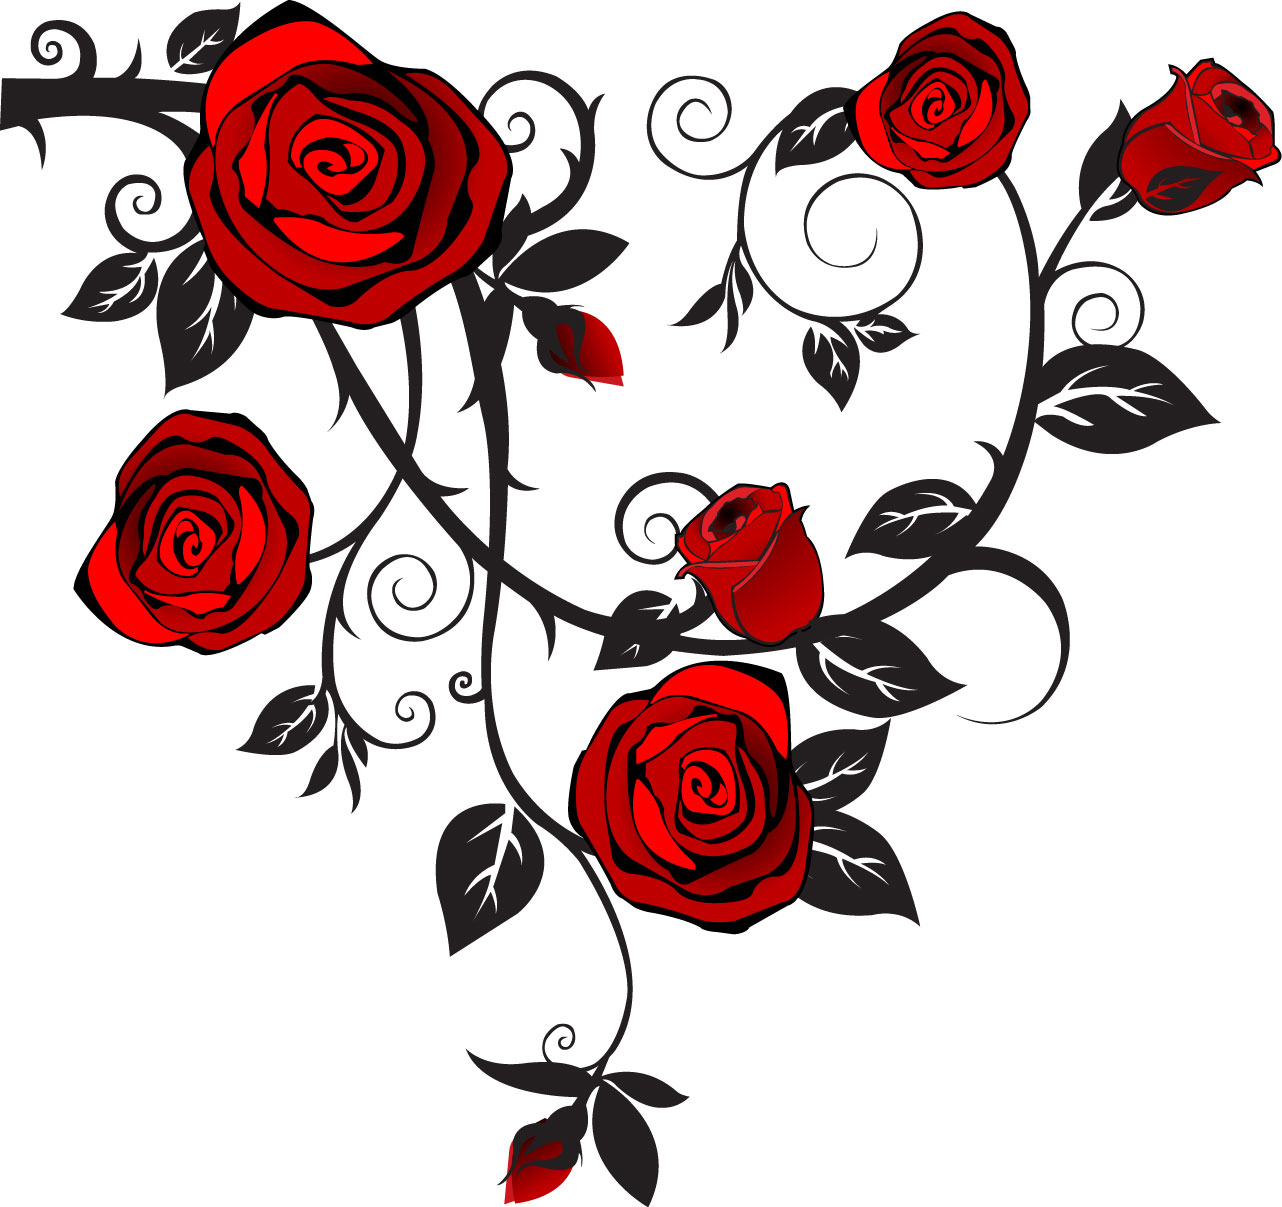 1282x1207 Tattoovorlagen Rosenranke Tattoo Designs Rose